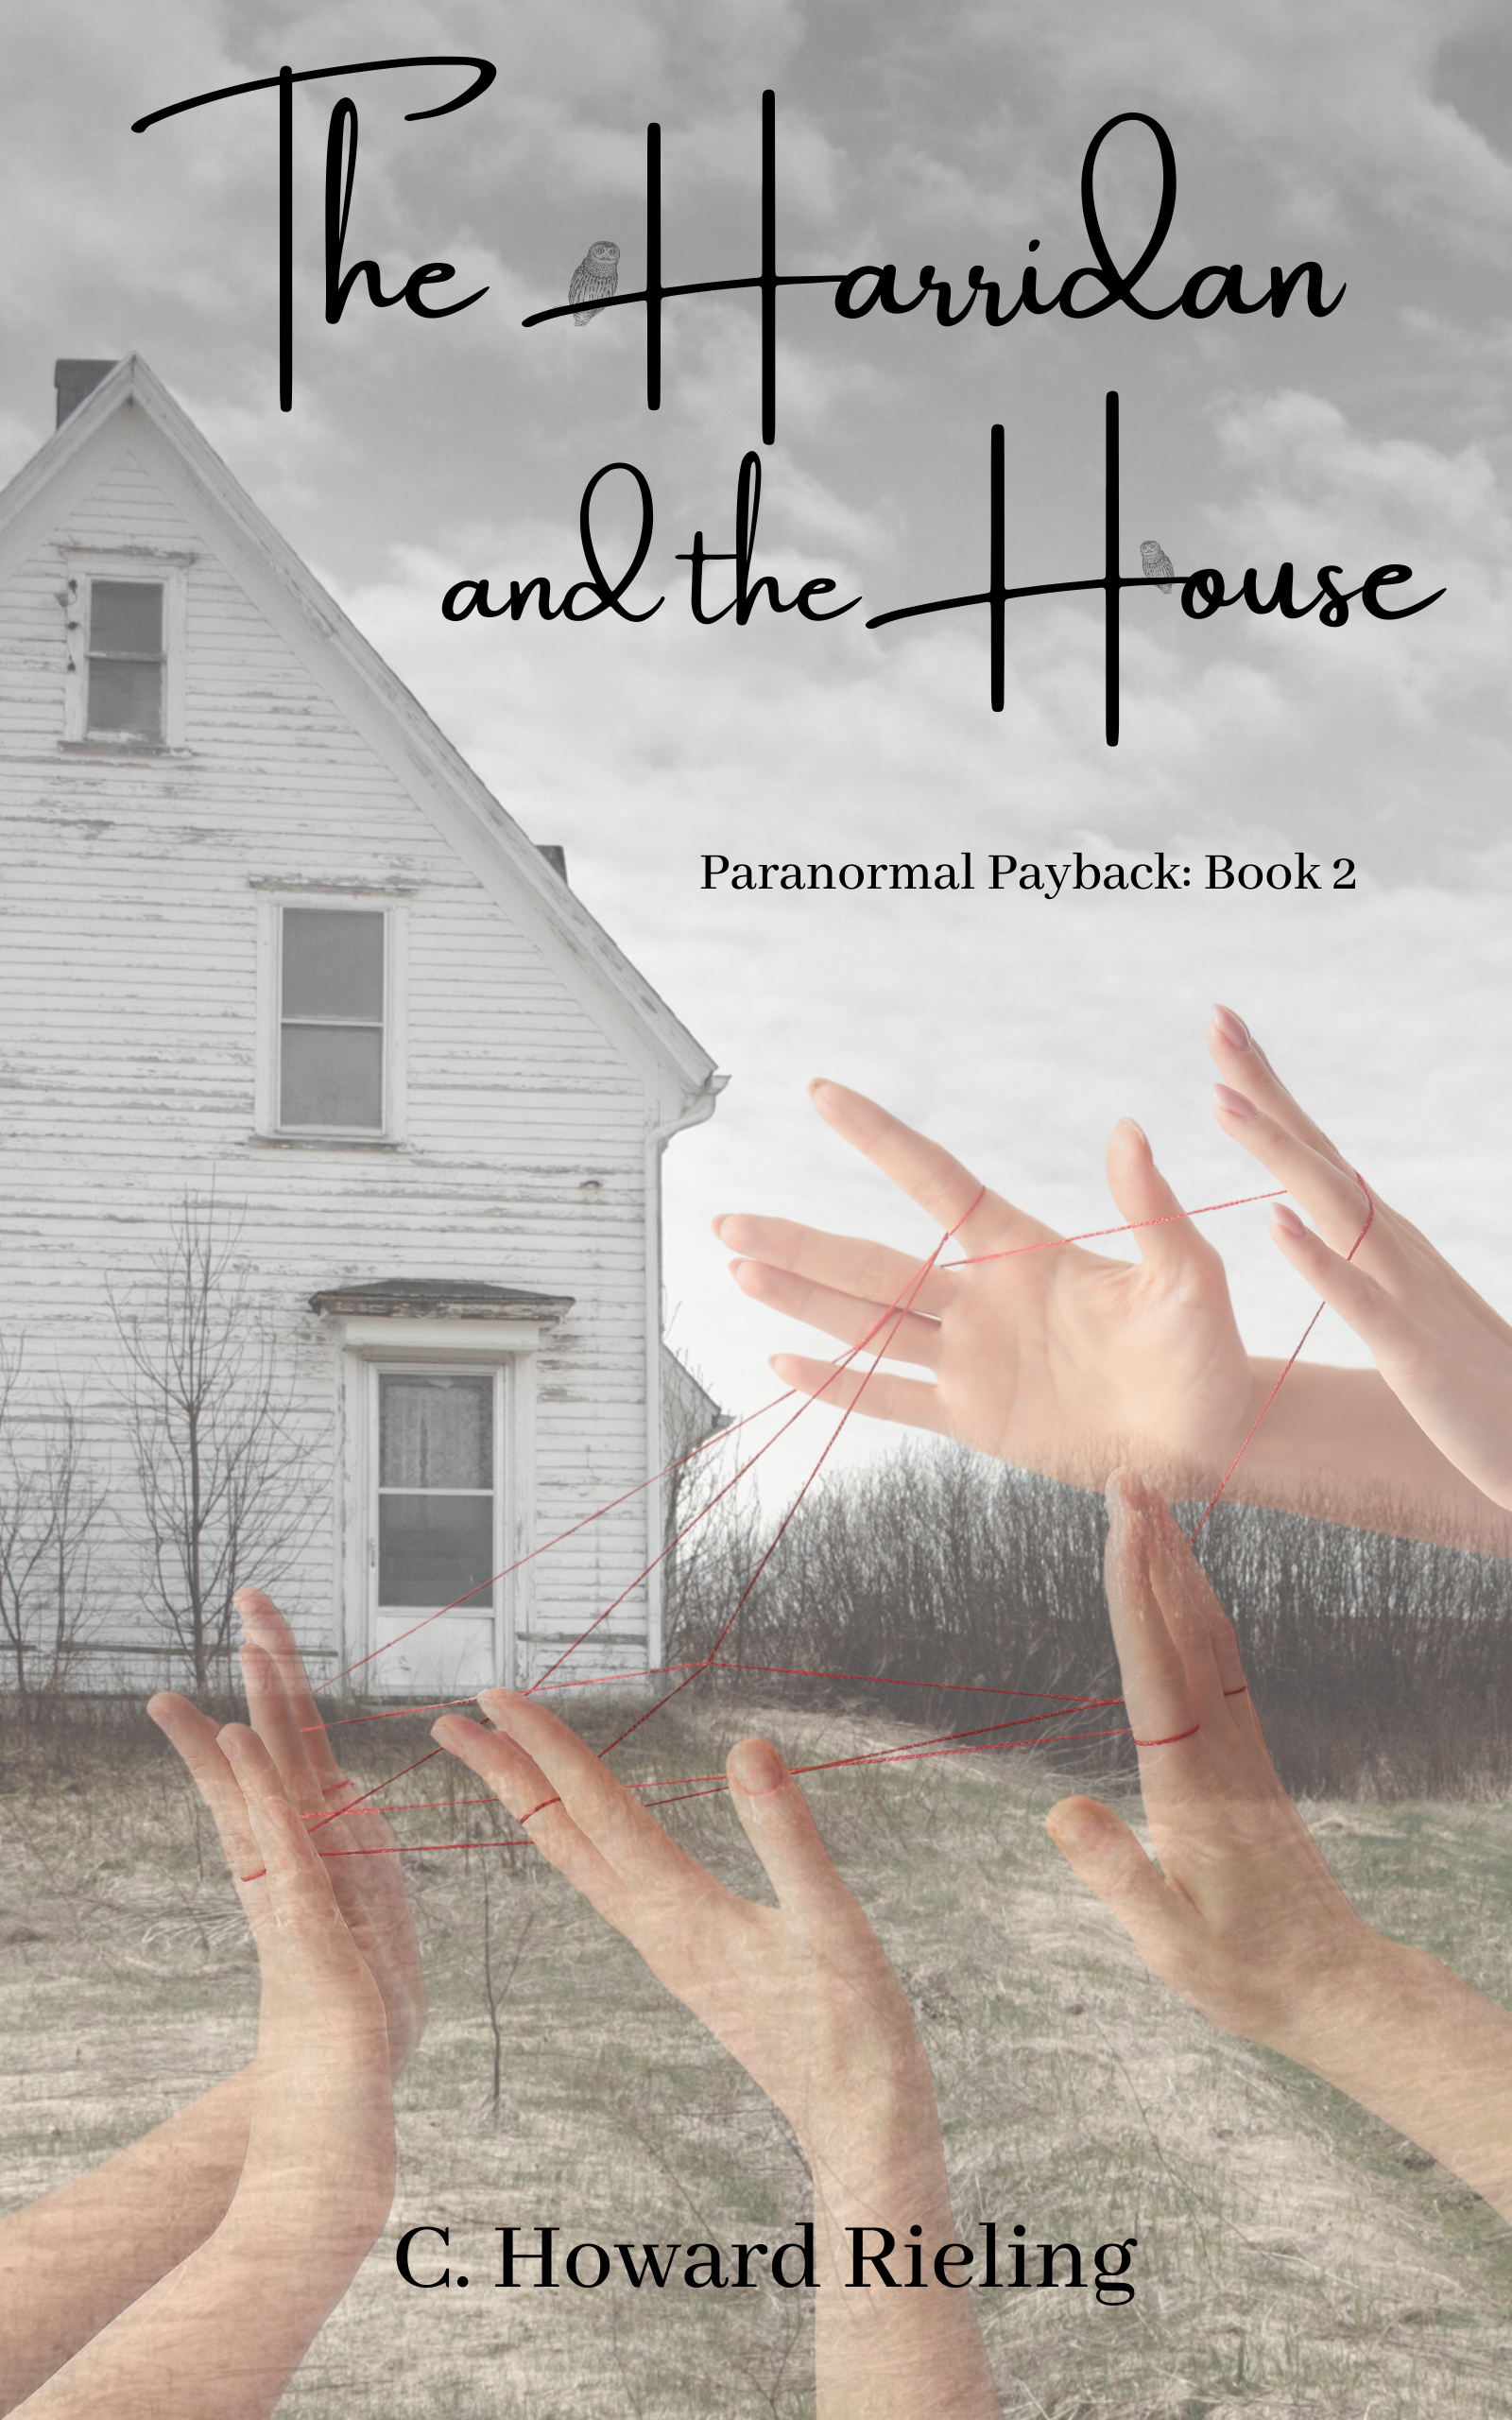 TheHarridanandtheHouse